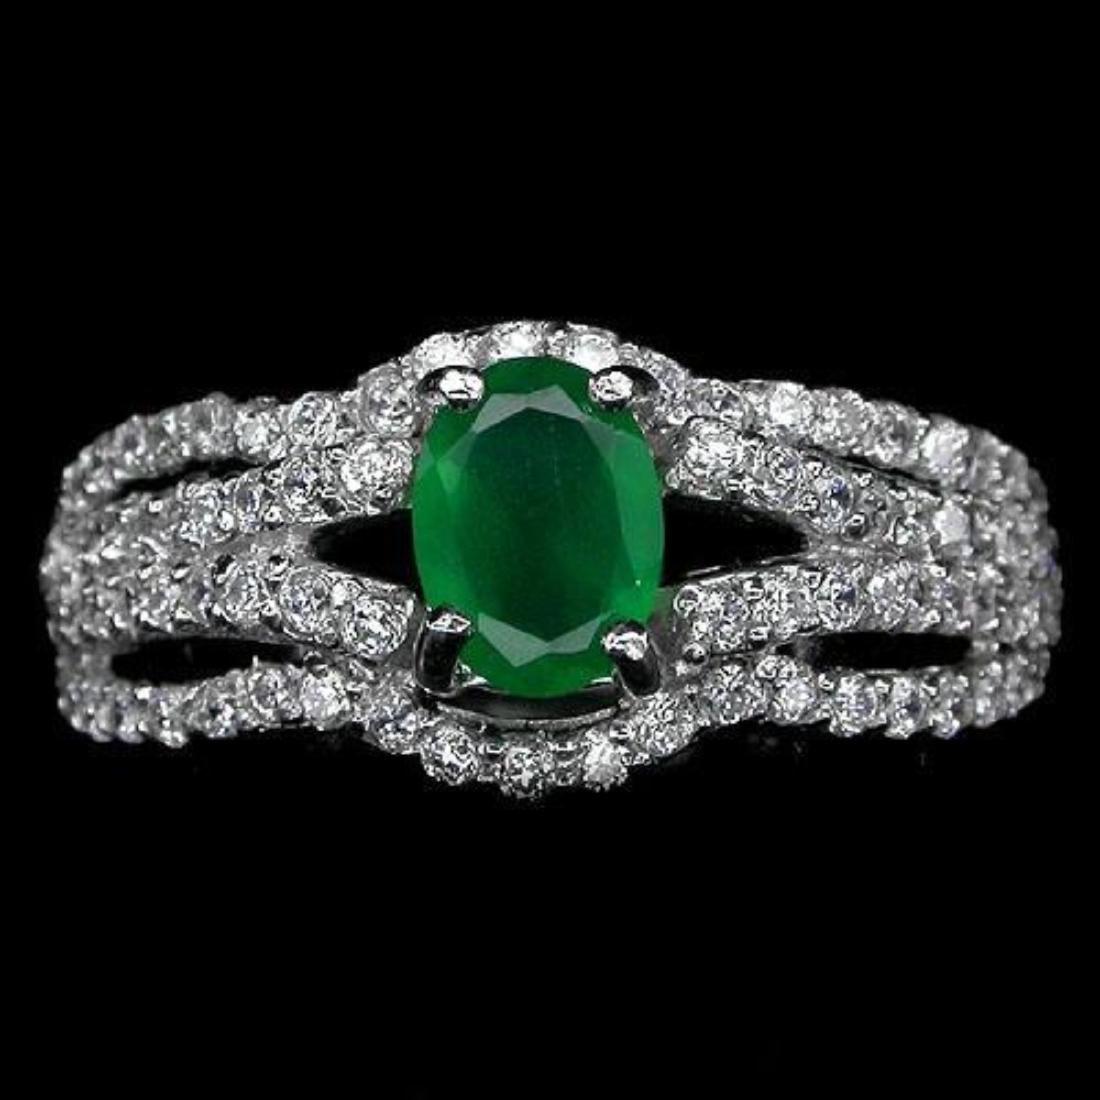 Elegant Green Aventurine Sterling Silver Ring - 2